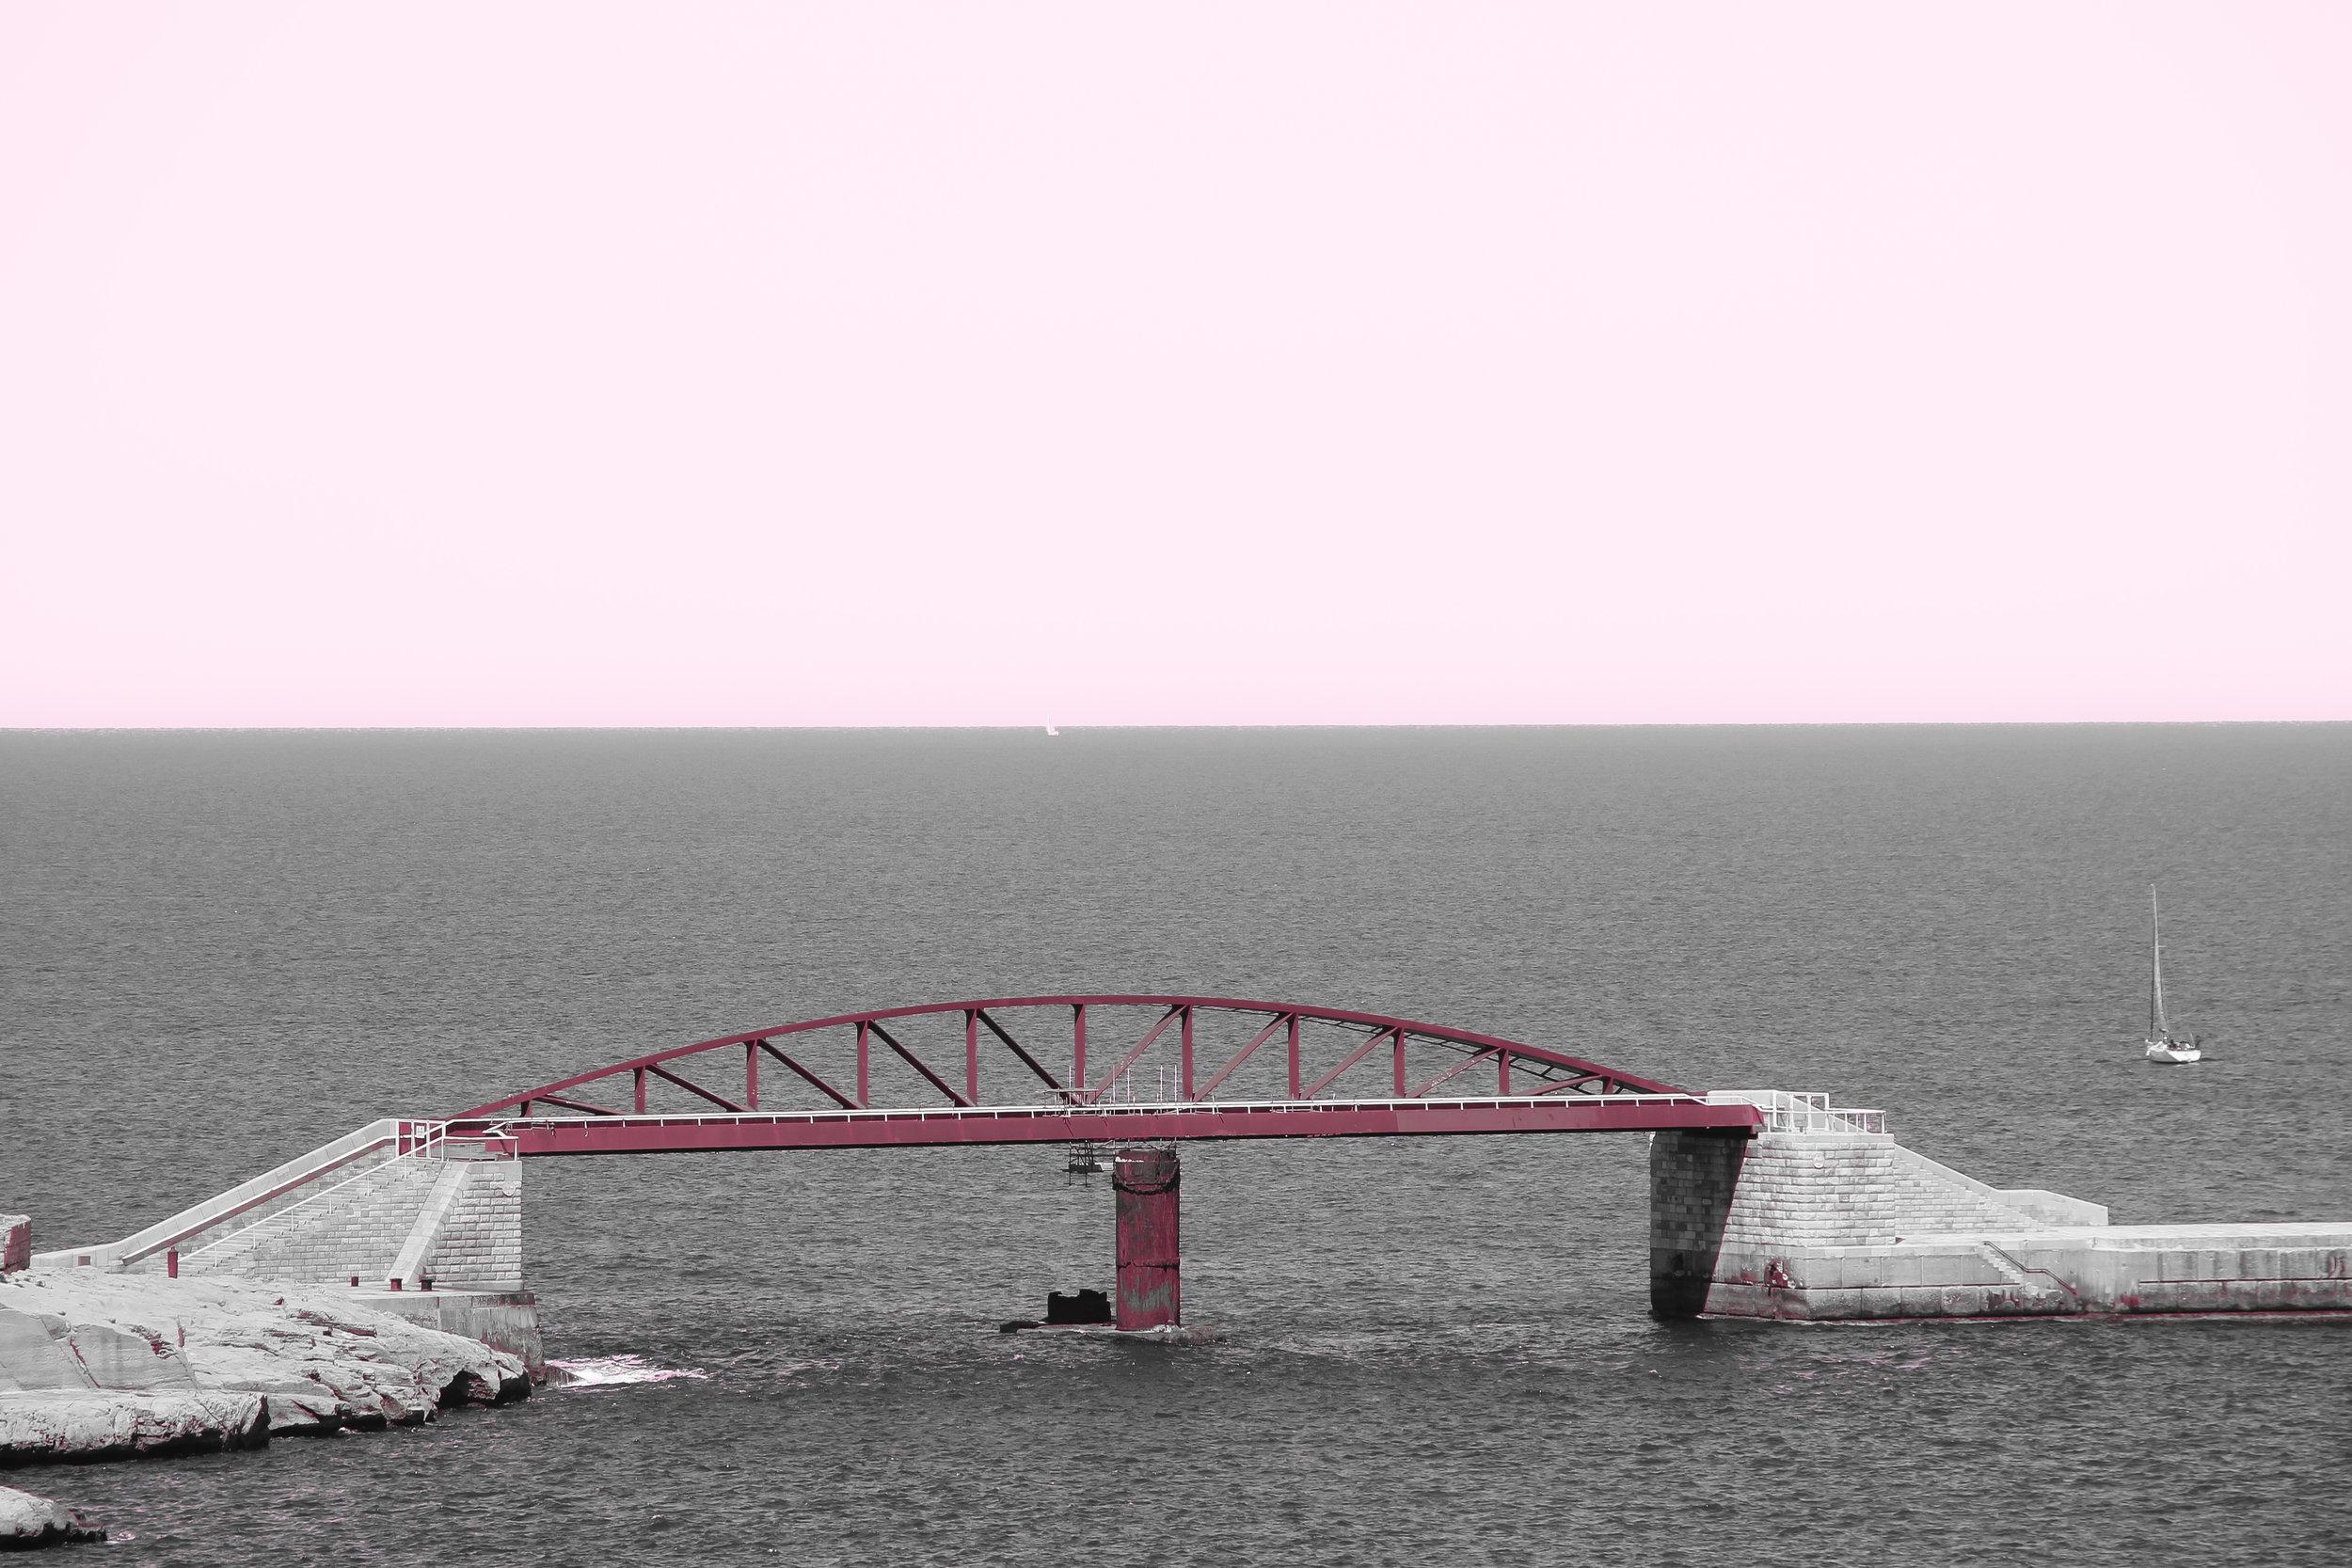 St Elmo Breakwater Bridge   the Mediterranean Sea   Valletta   - Thinking About Appreciation For Quality In Malta   Malta, Europe   DoLessGetMoreDone.com   - Canon Minimal Travel Documentary Photography   Fine Art Photography - search for liveability   Sustainability